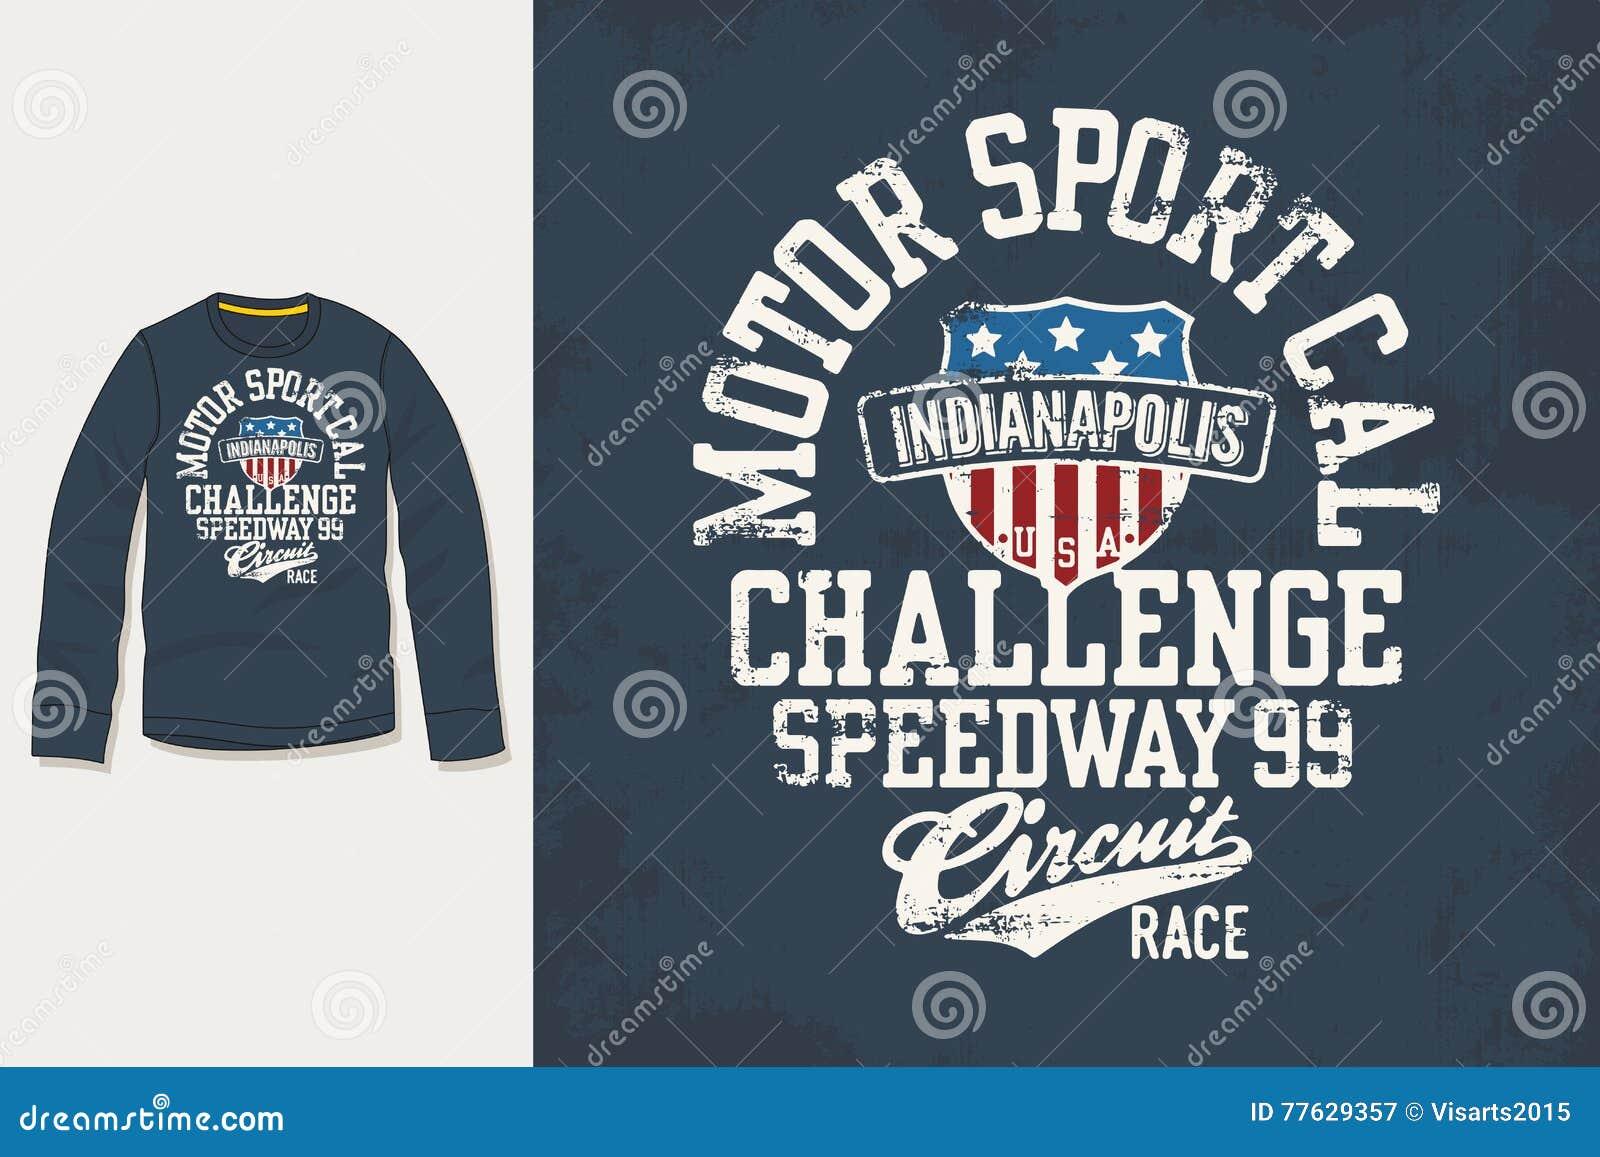 Design t shirt artwork - Artwork Design Graphic Motor Print Shirt